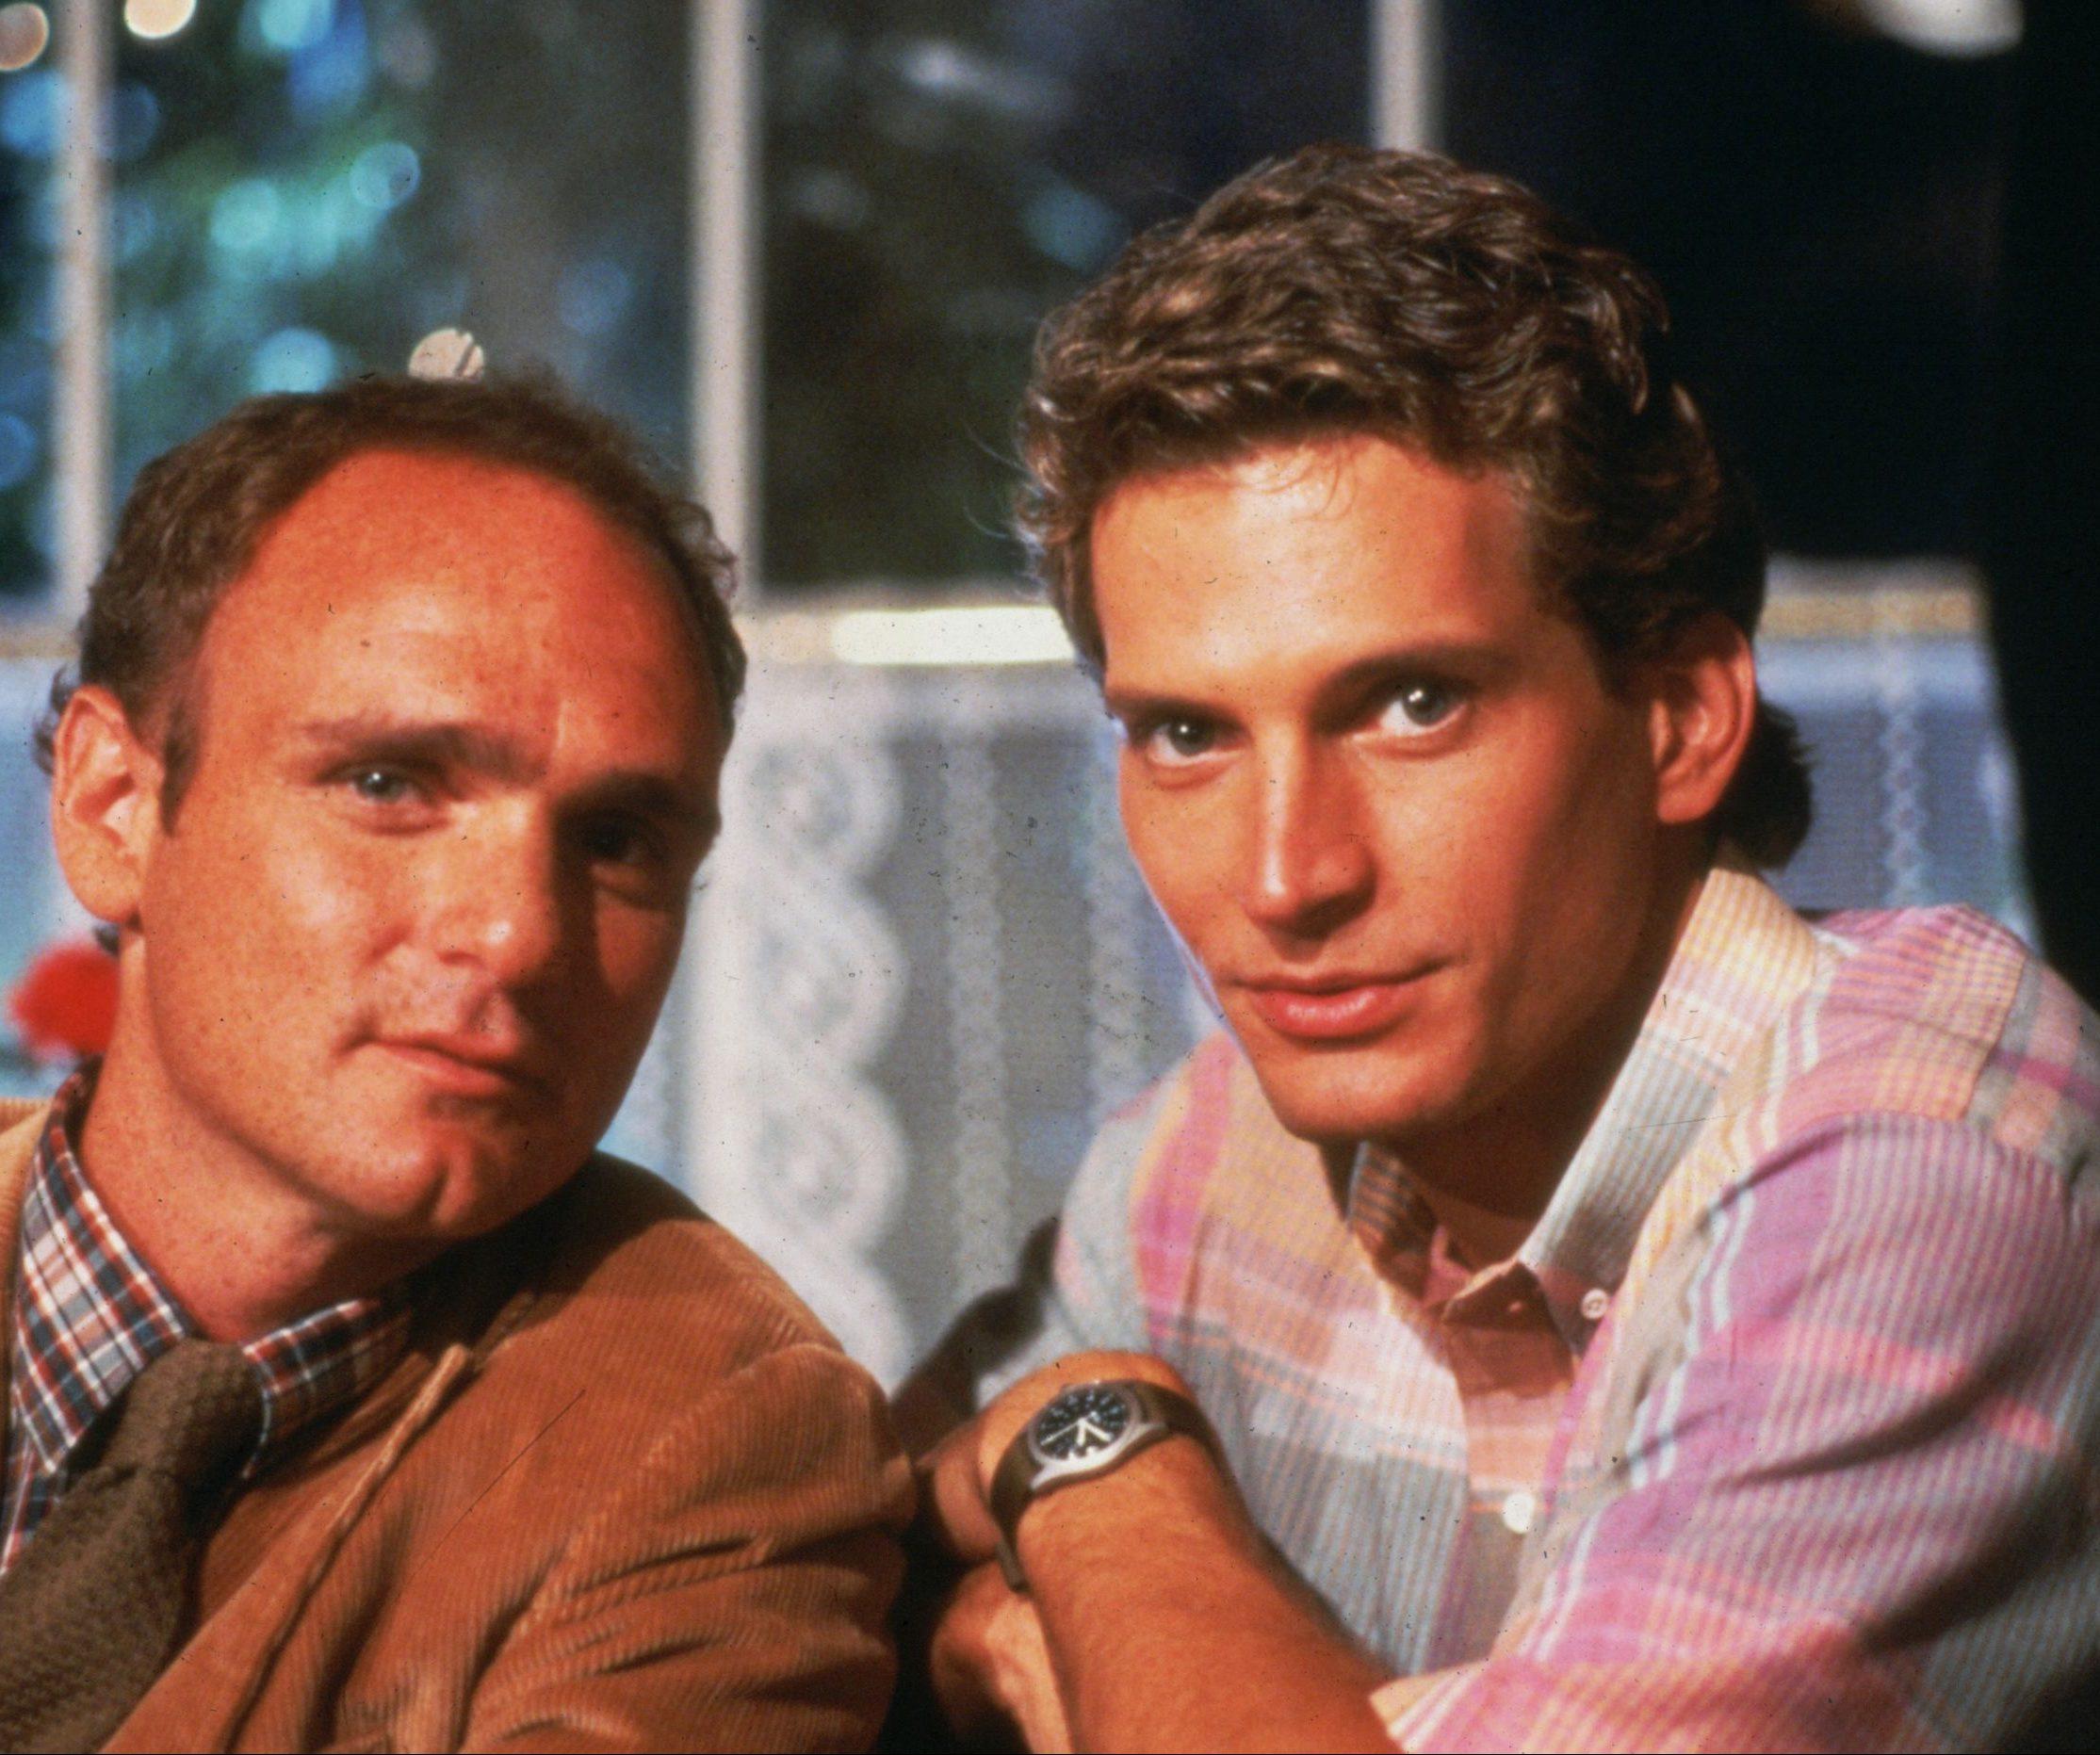 9 rex smith street hawk e1597834338619 20 Hilariously Wonderful Photos Of 80s Male TV Stars